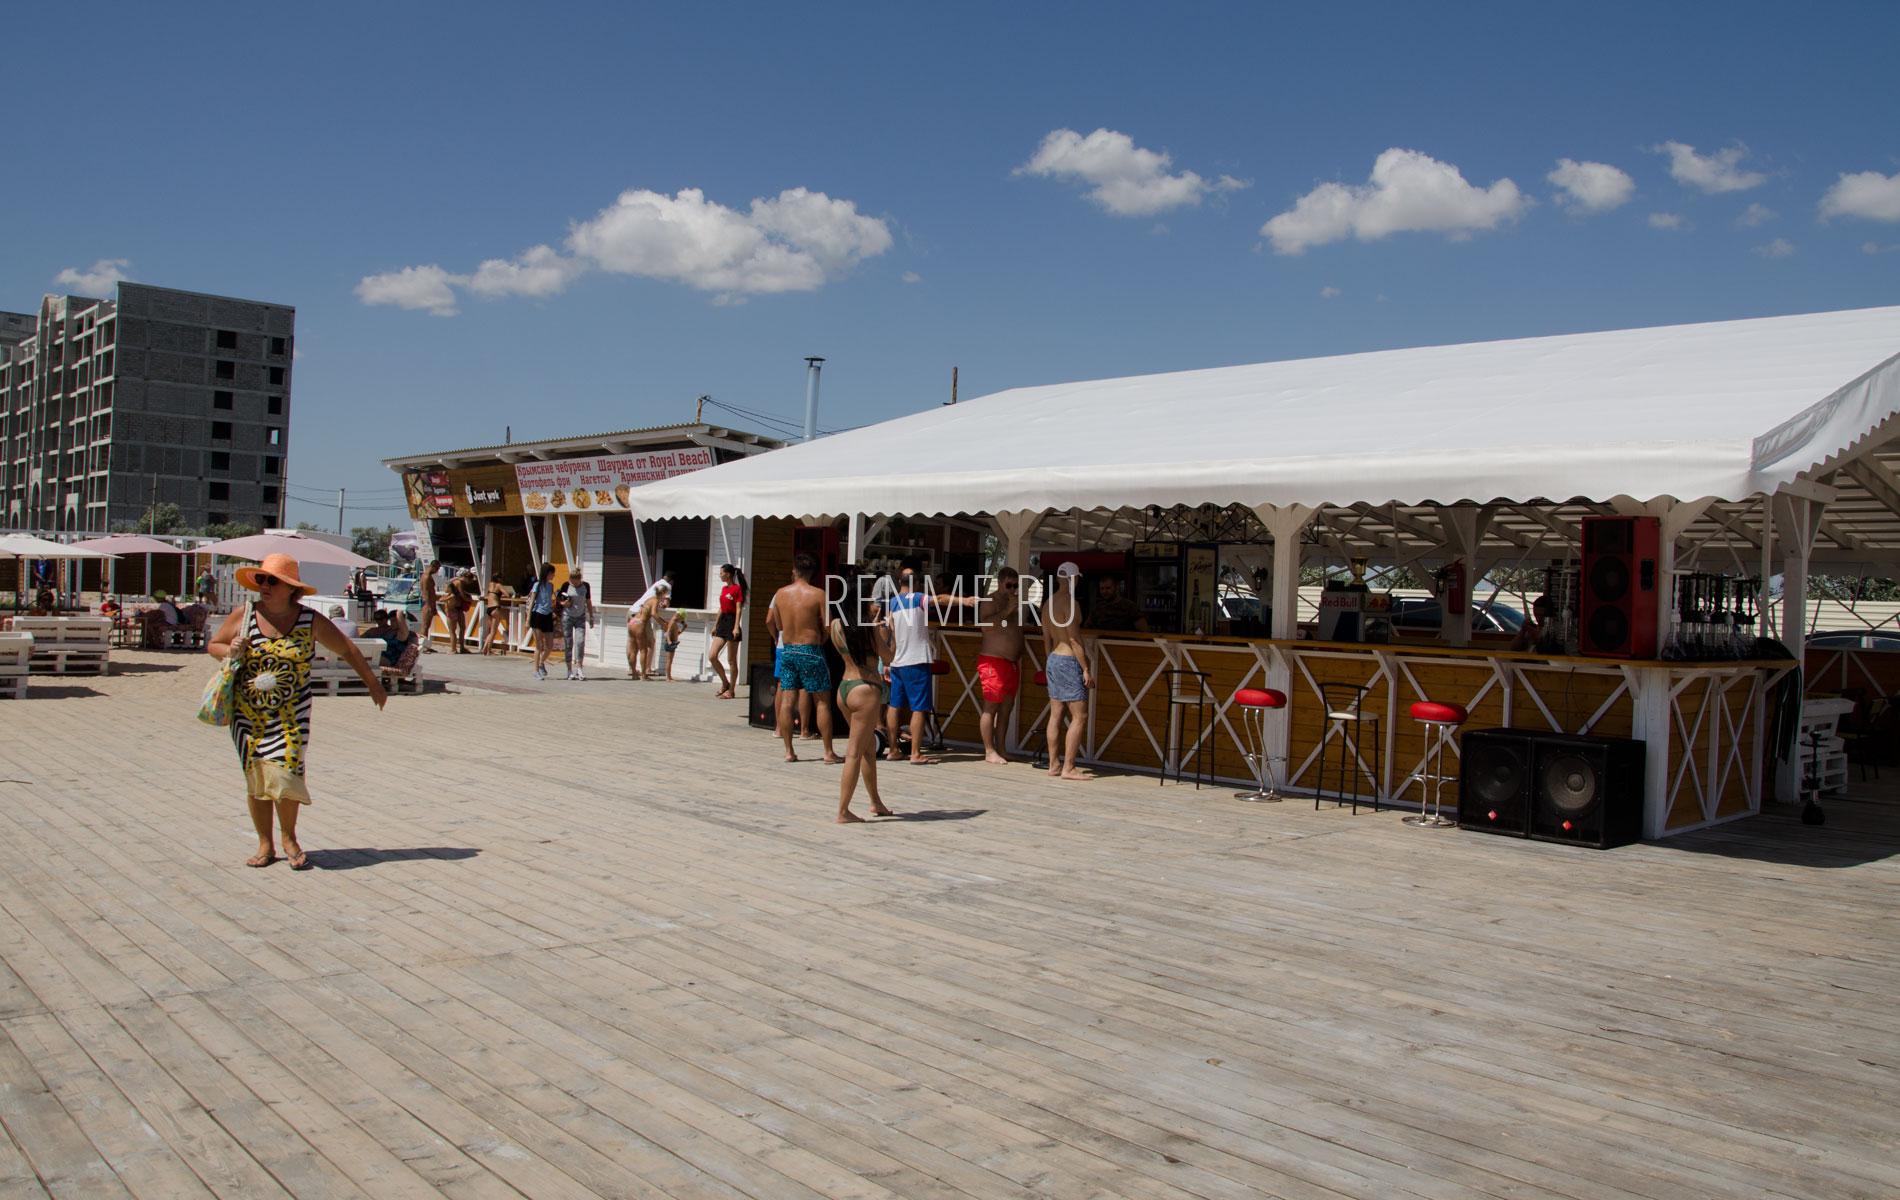 Кафе на песчаном пляже в Евпатории. Фото Евпатории